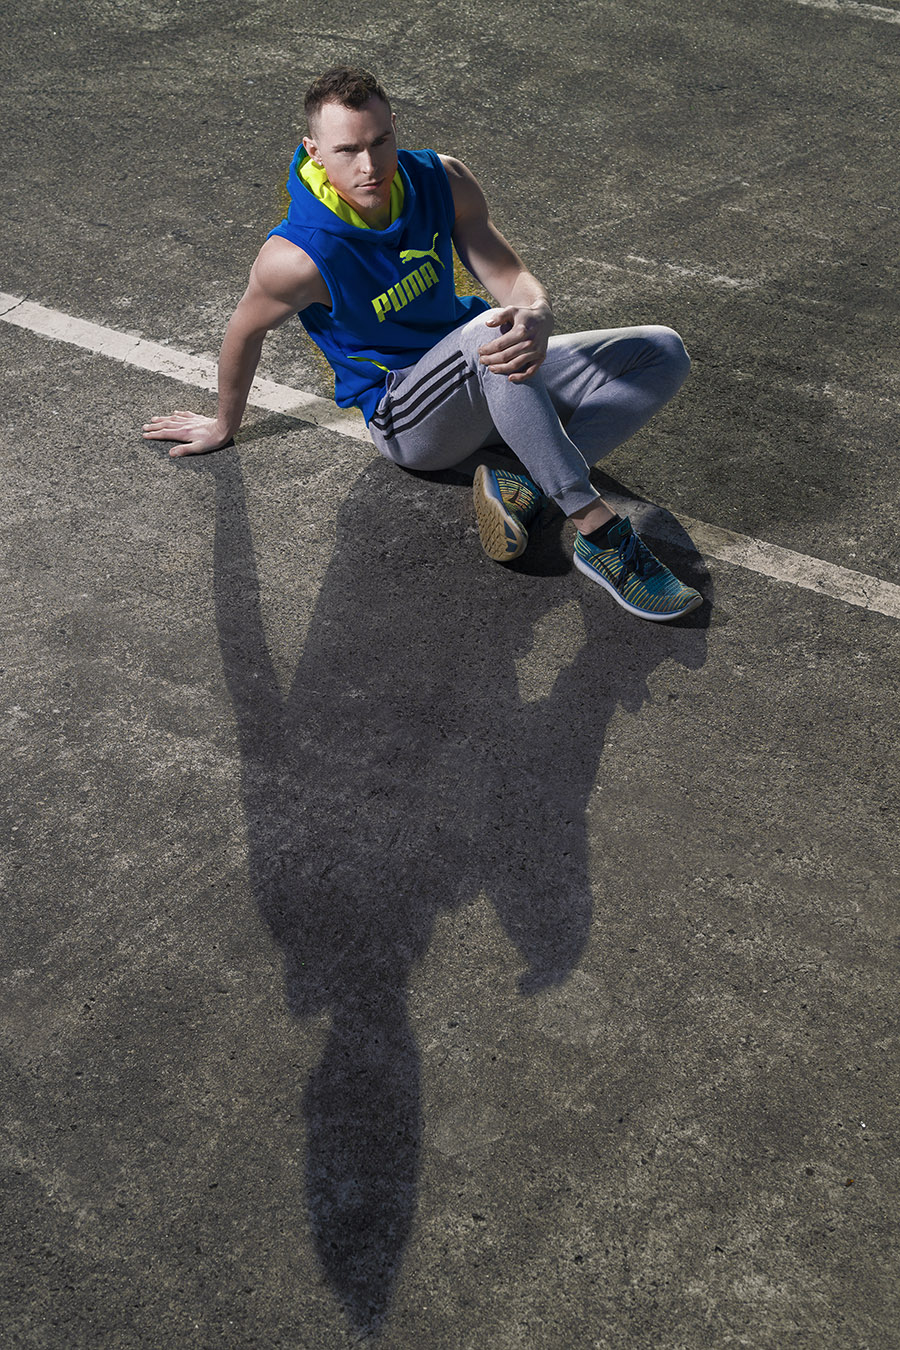 Jordan seated on ground in Melbourne car park